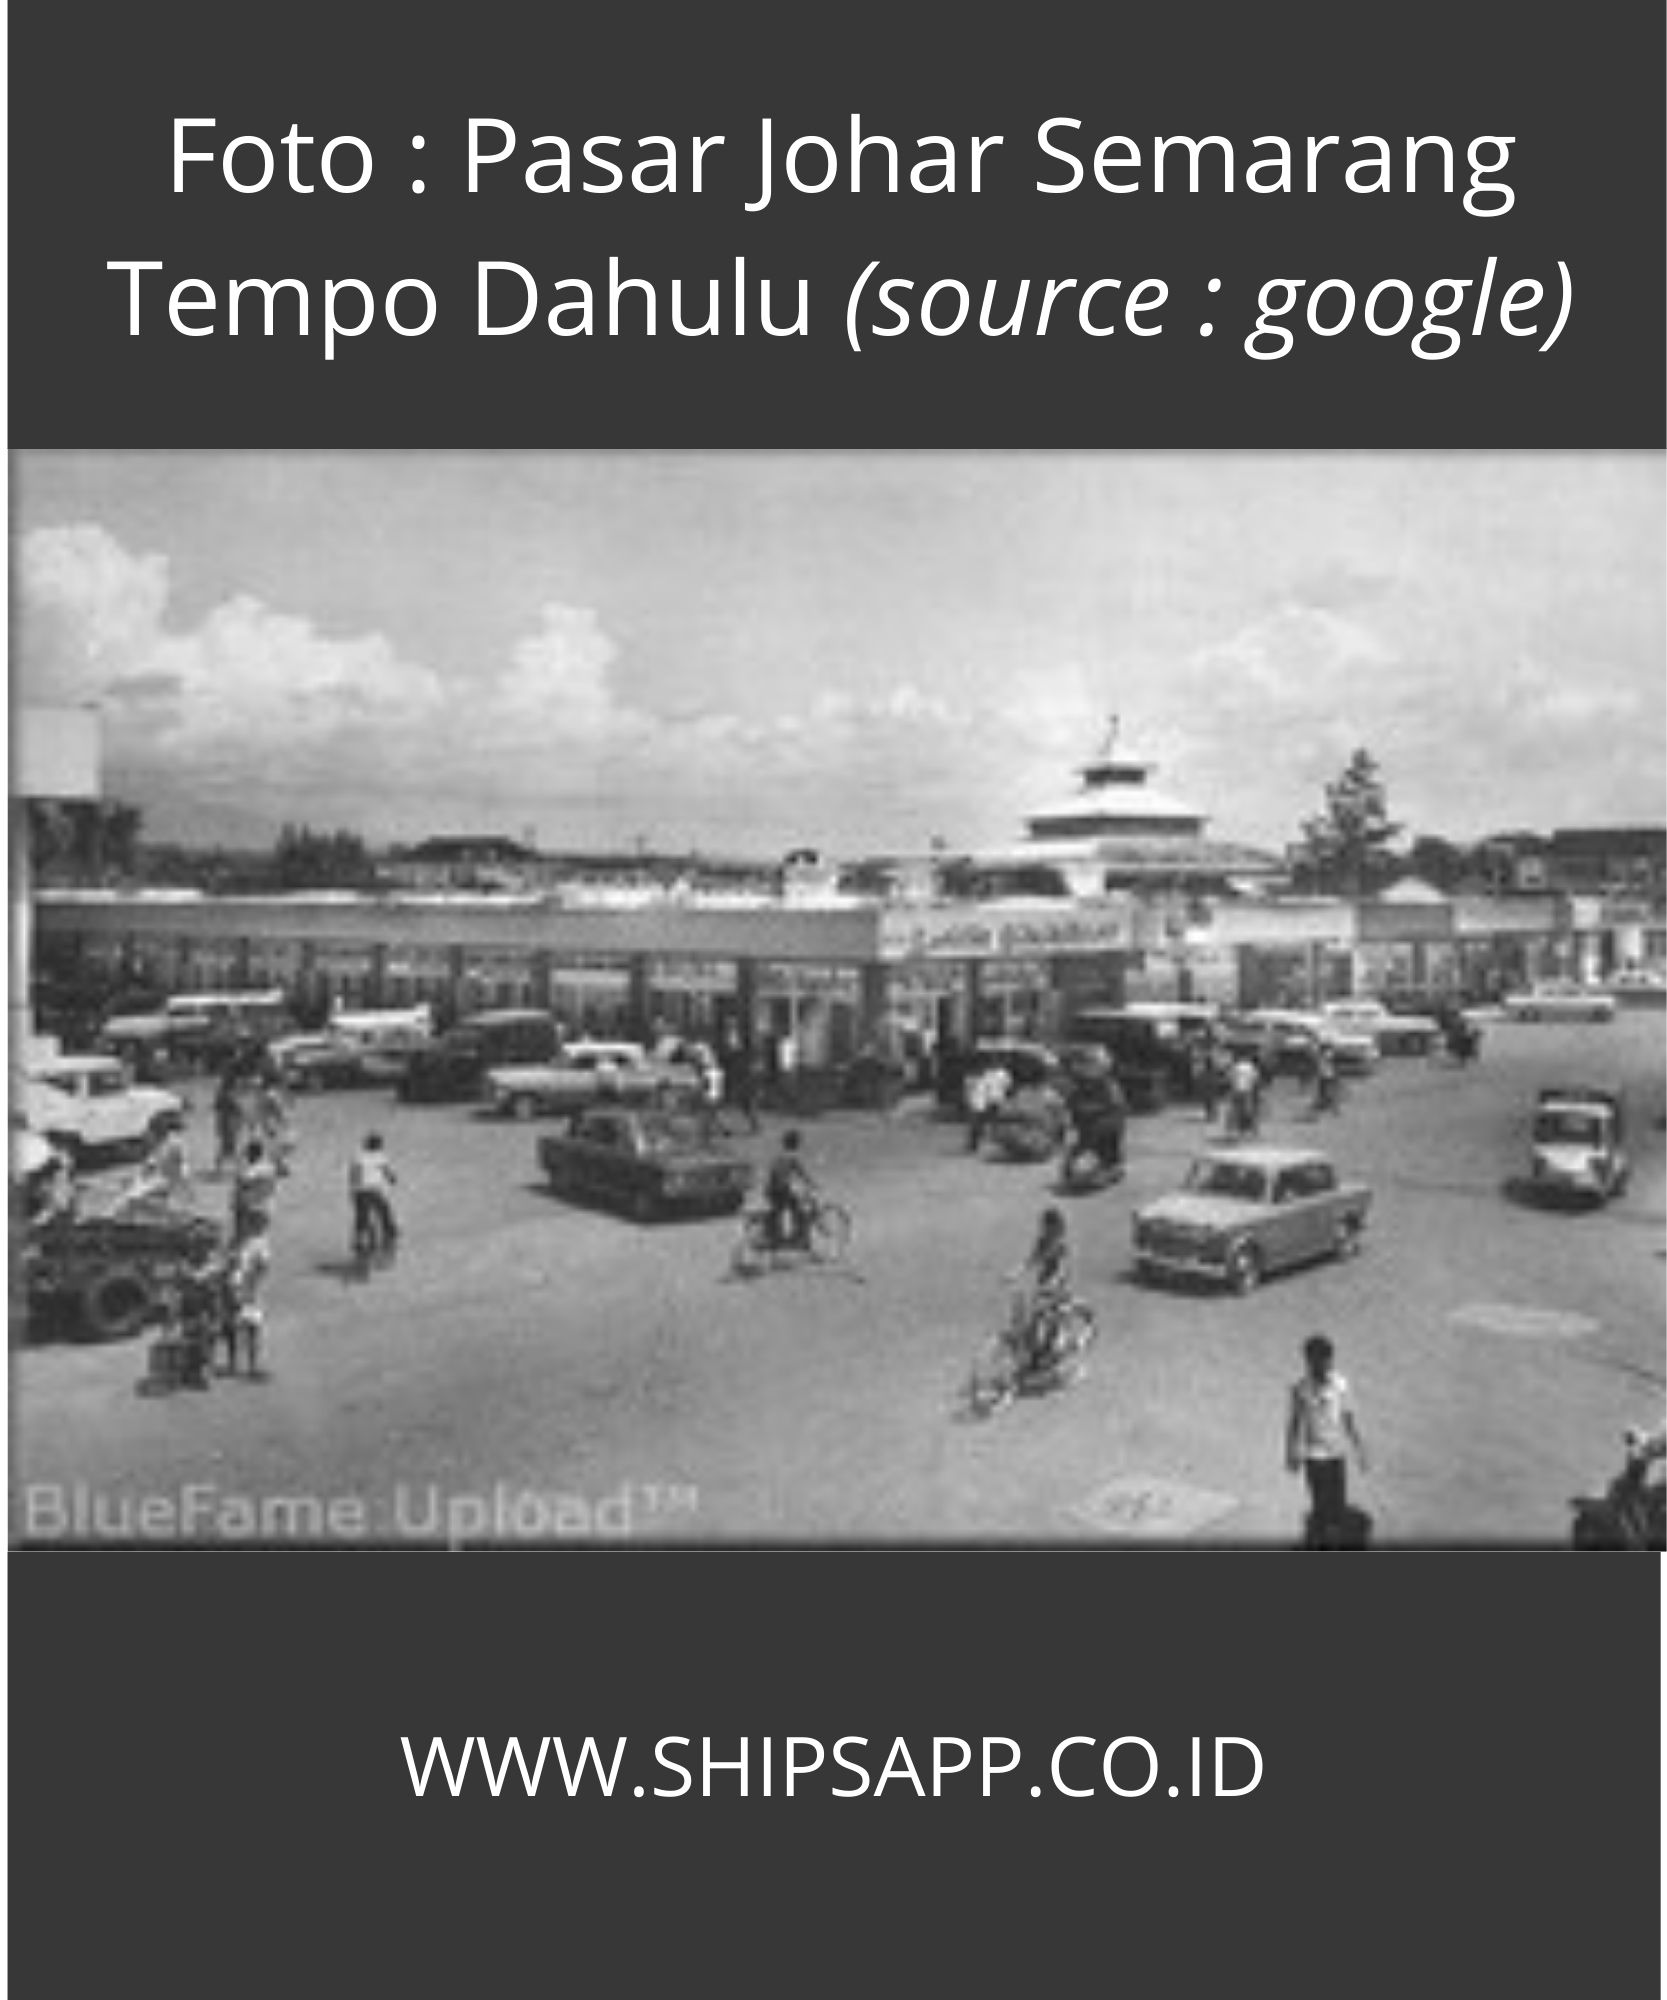 Sejarah Pelabuhan Tanjung Emas